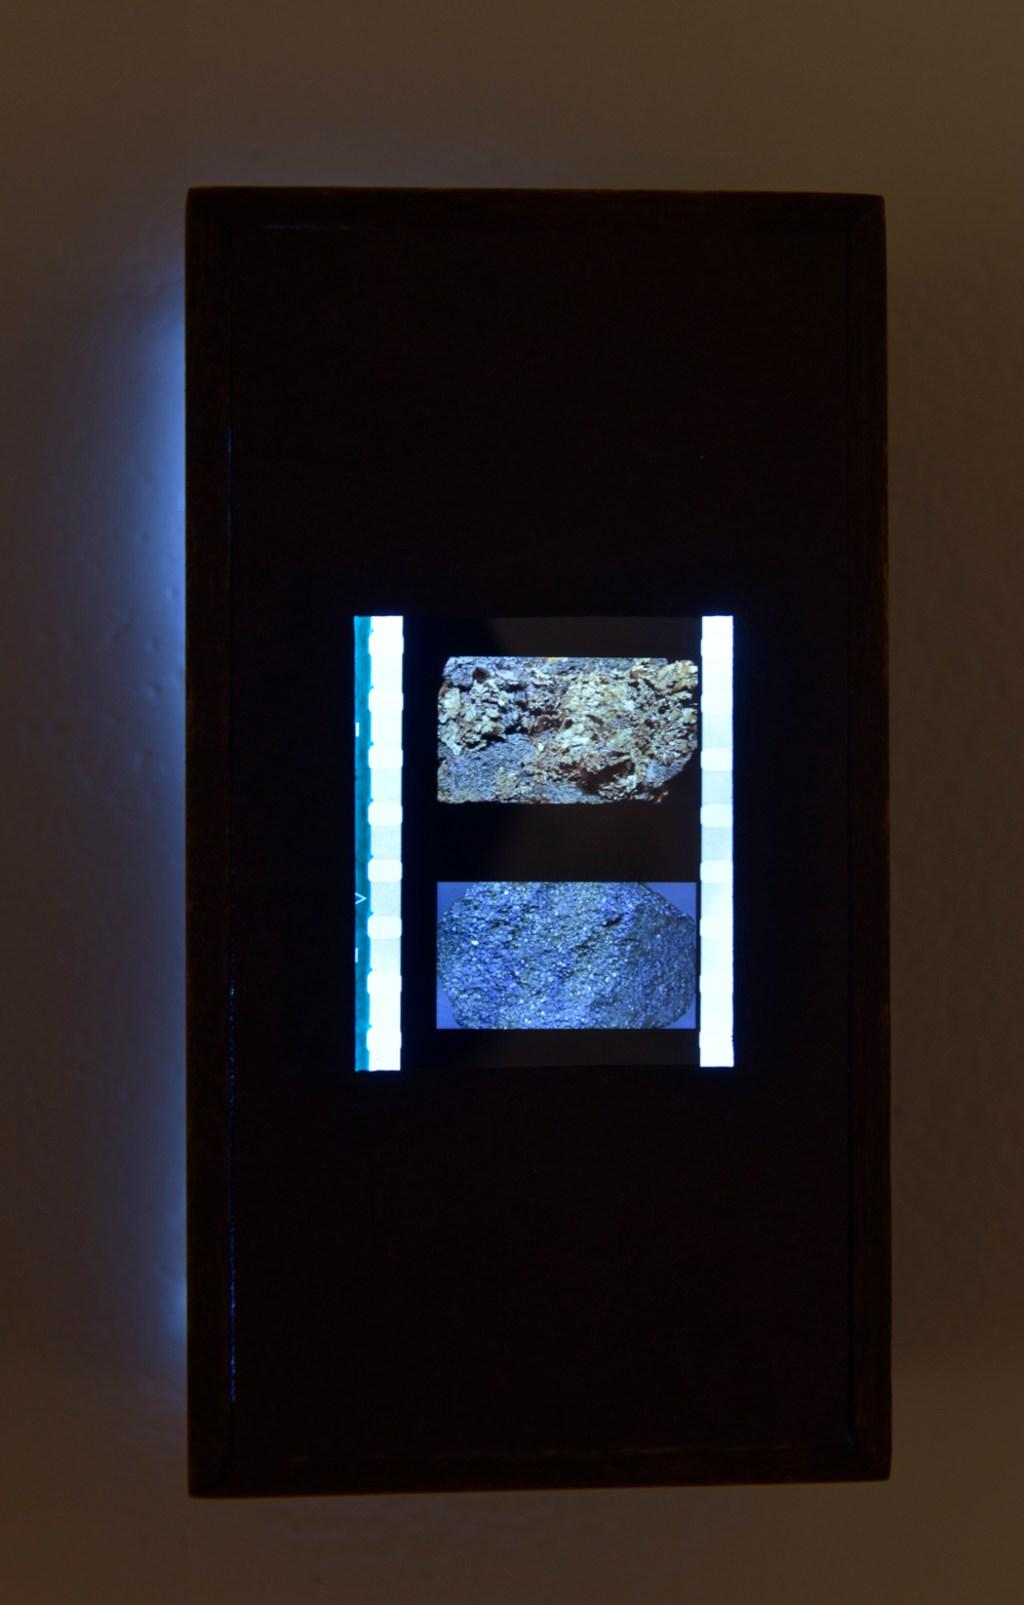 Michael Powell, Pyrite, Gold, 35mm film on lightbox, 2016.